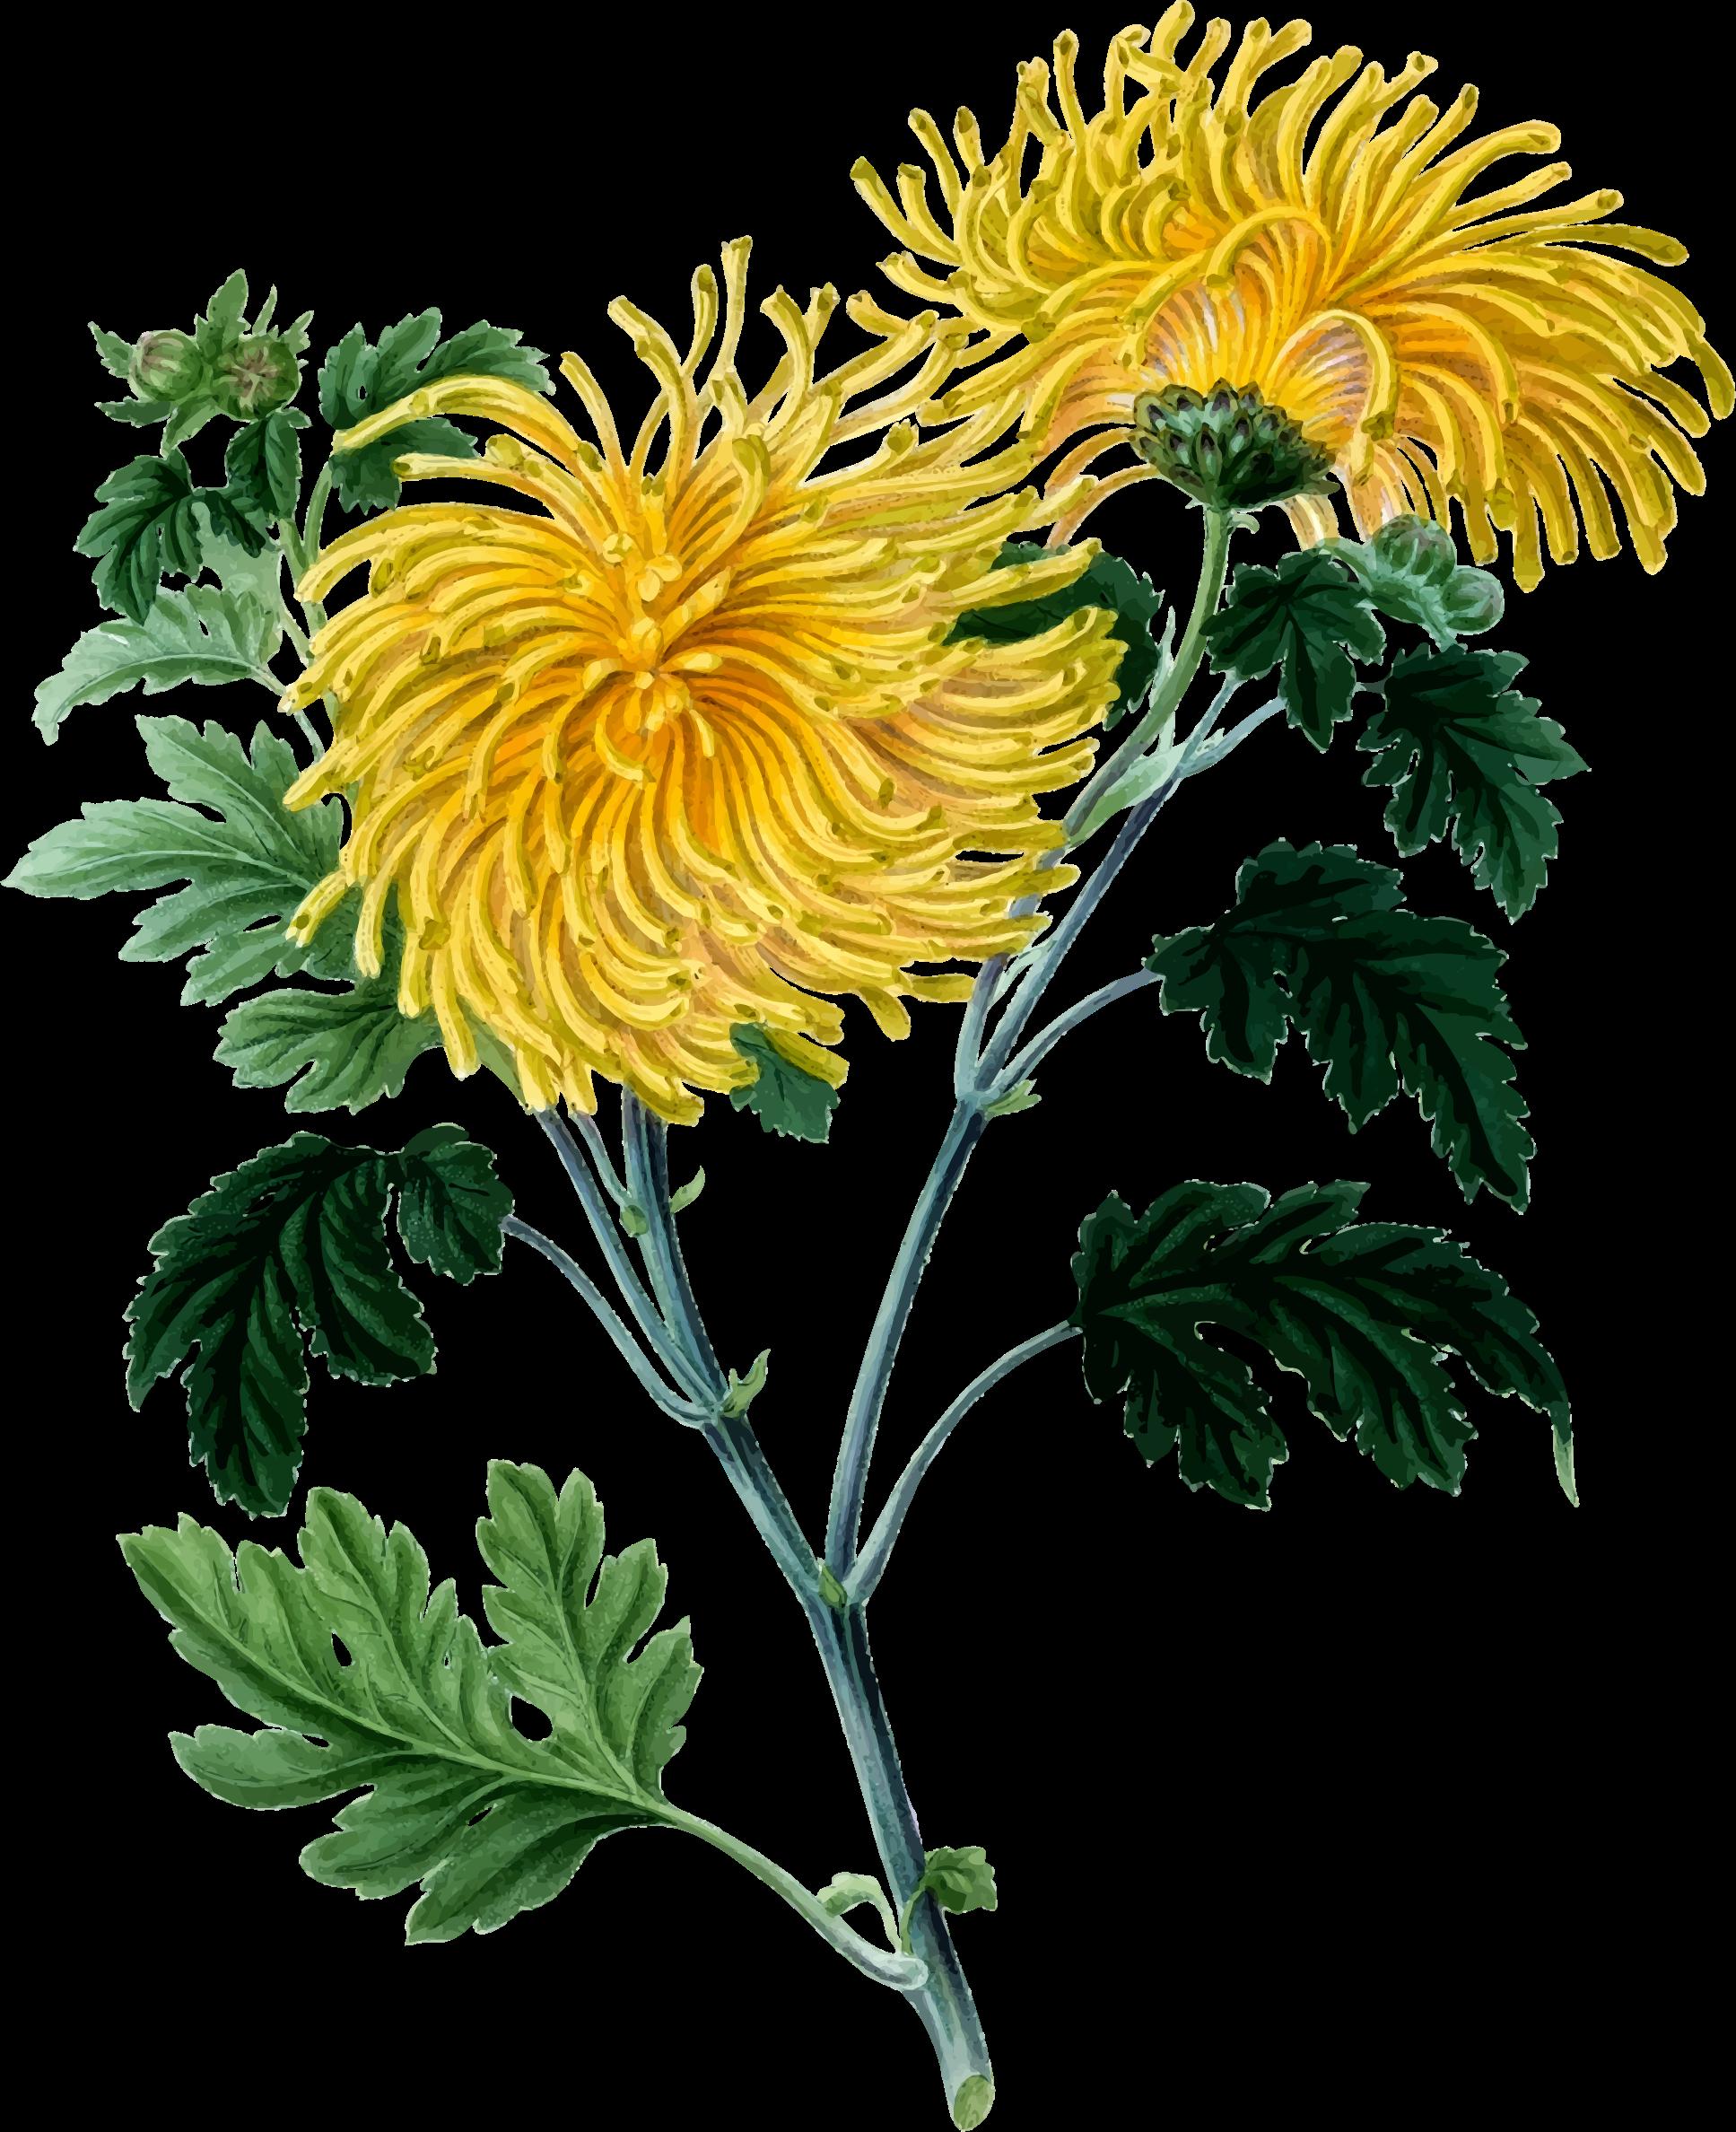 Chrysanthemum clipart Chrysanthemum Clipart Chrysanthemum 2 2